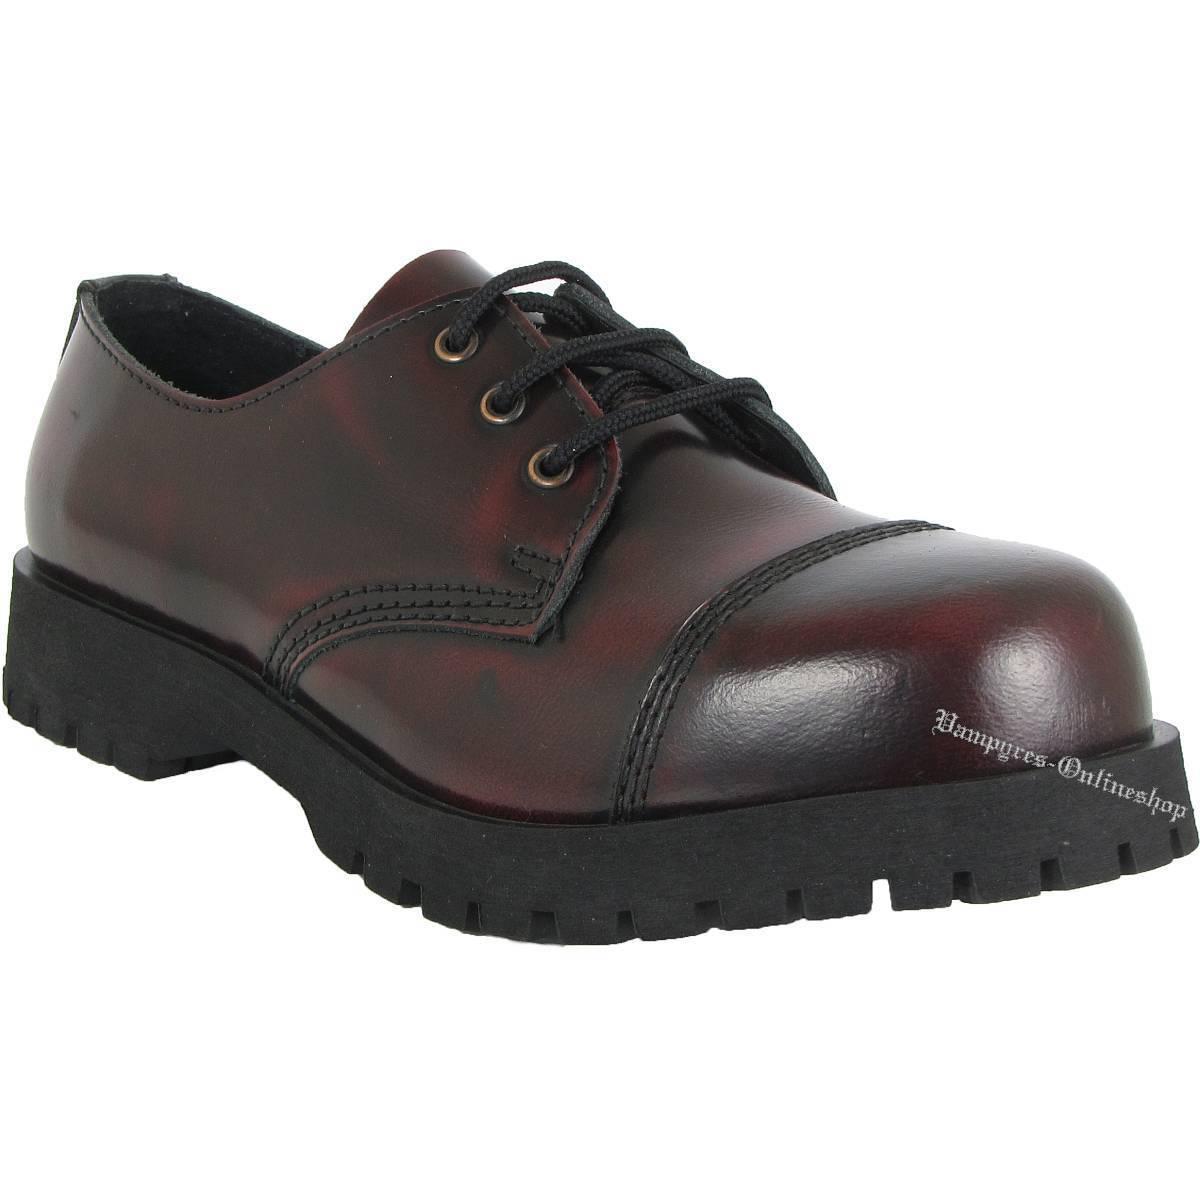 Boots And Braces 3-Loch Rot Rub-Off Schuhe Leder Rangers Stahlkappe Halbschuhe